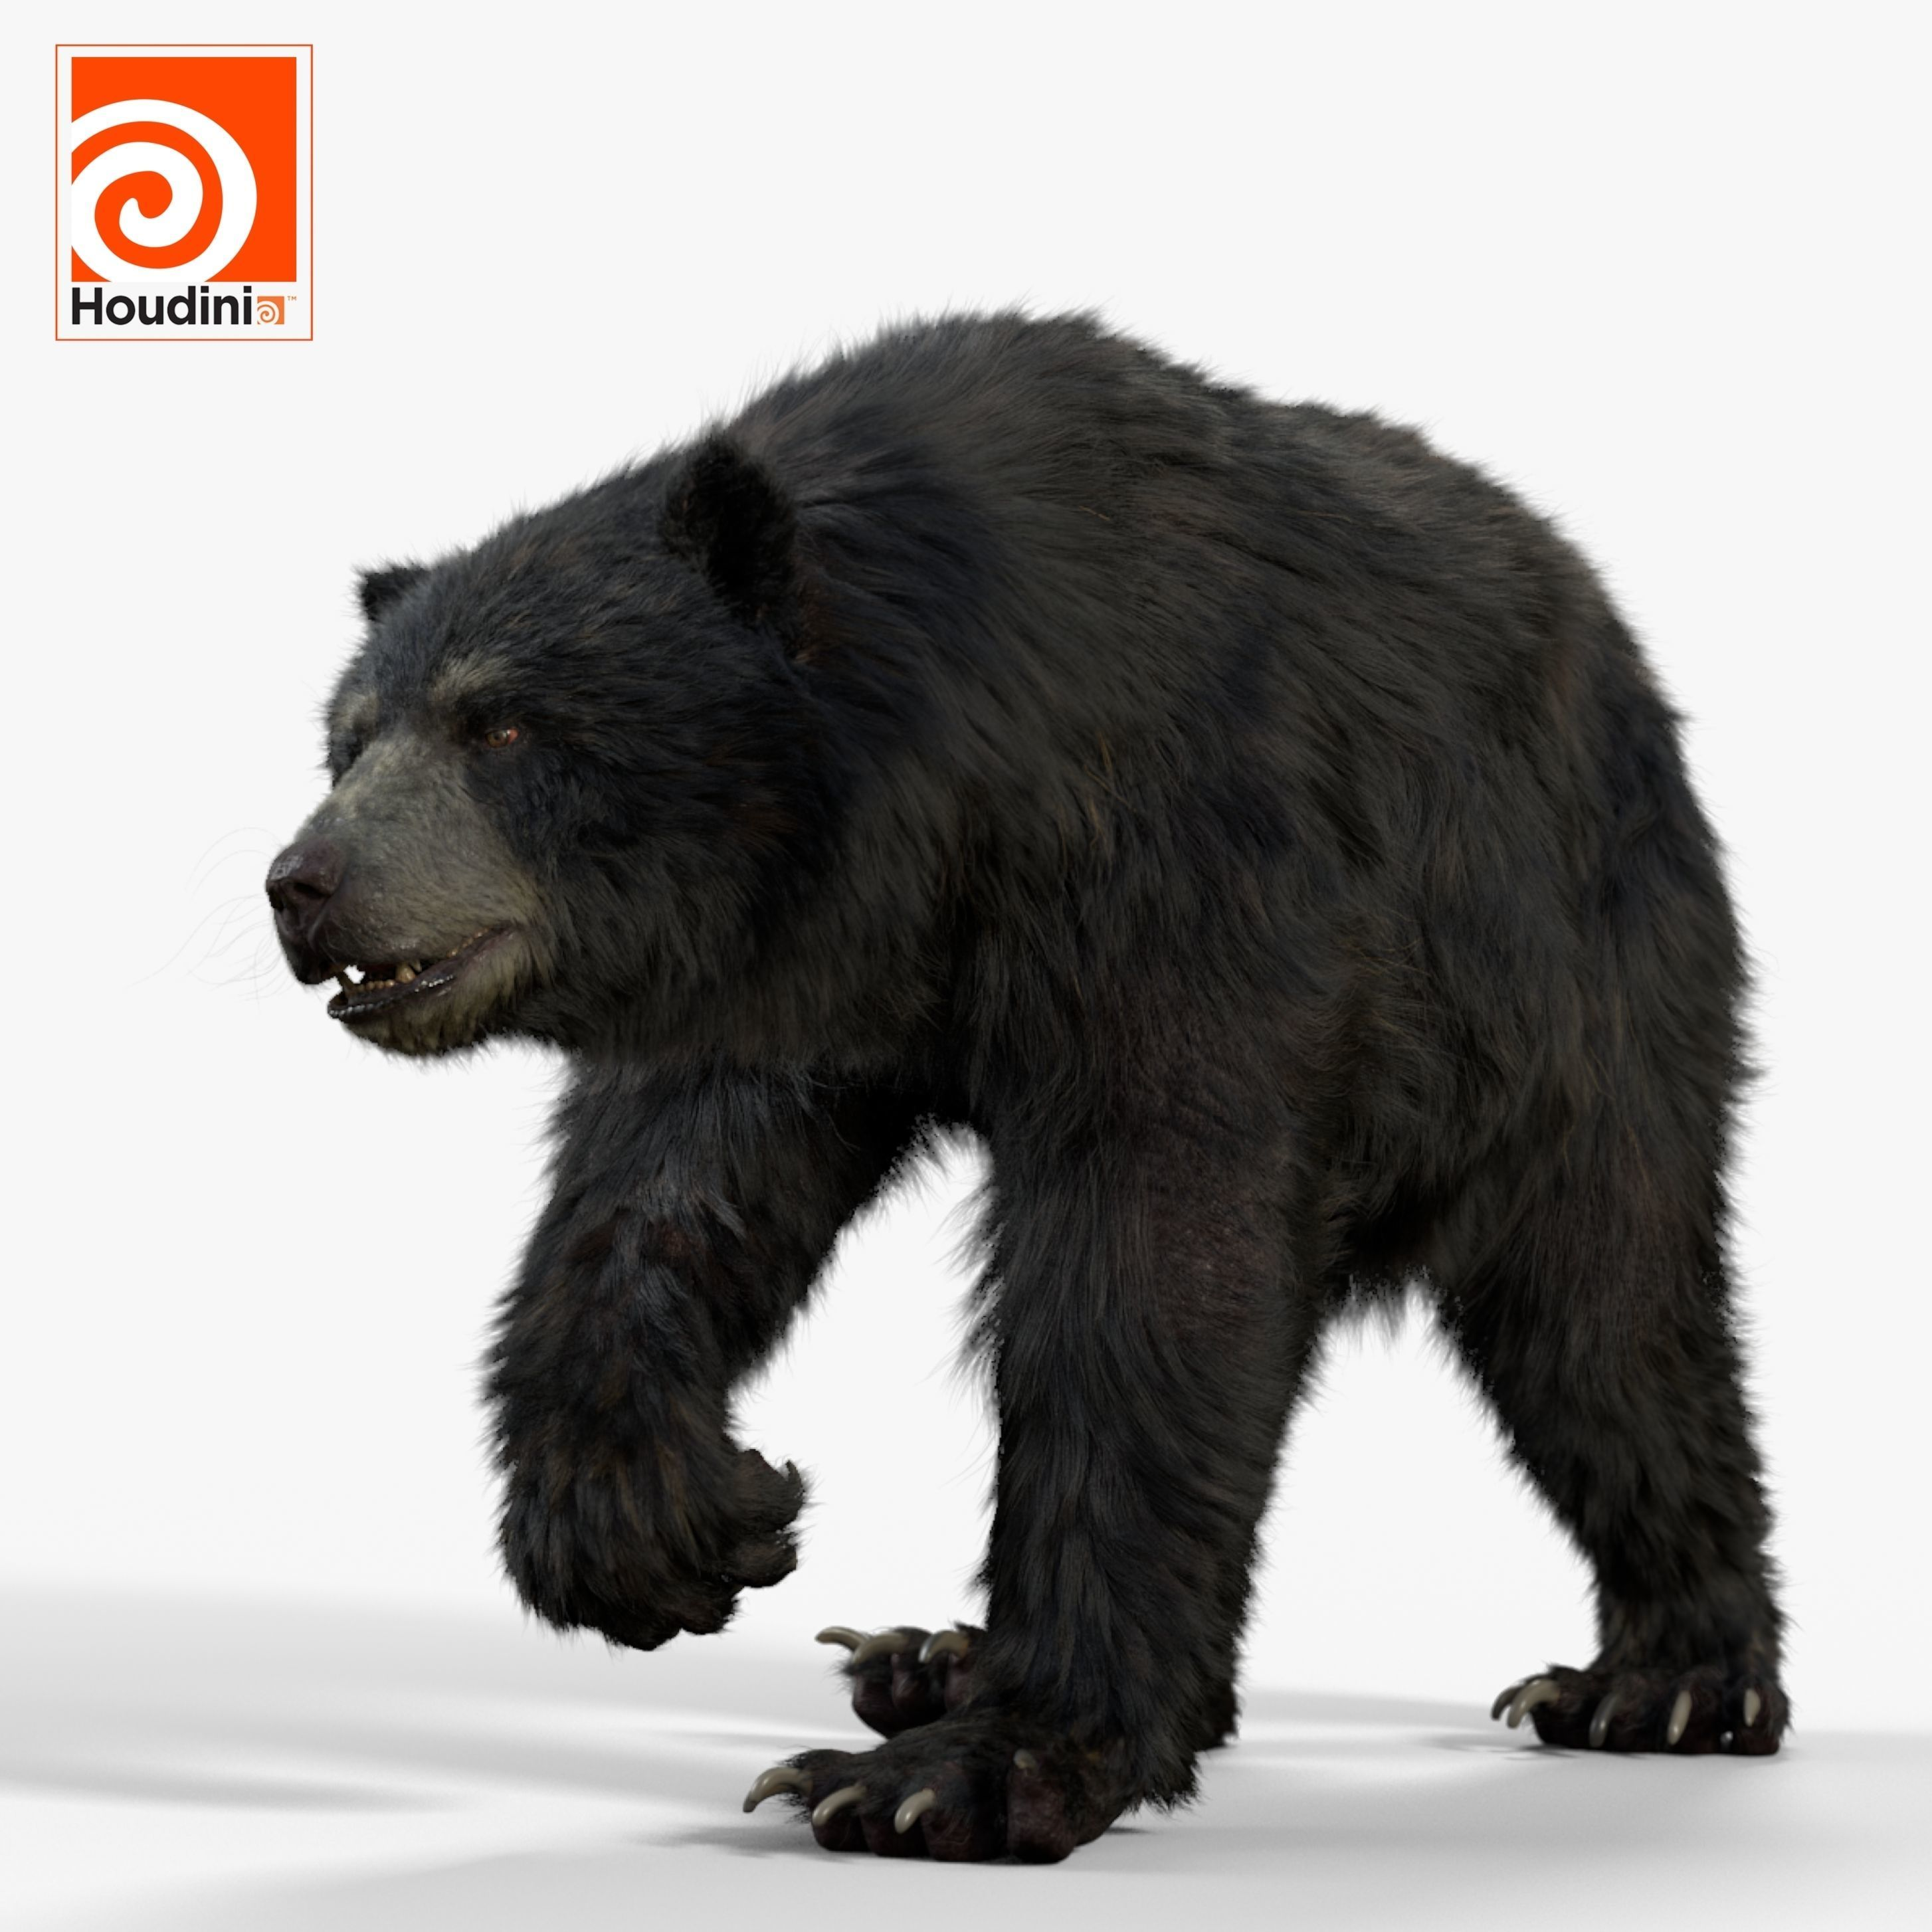 bear black MOD